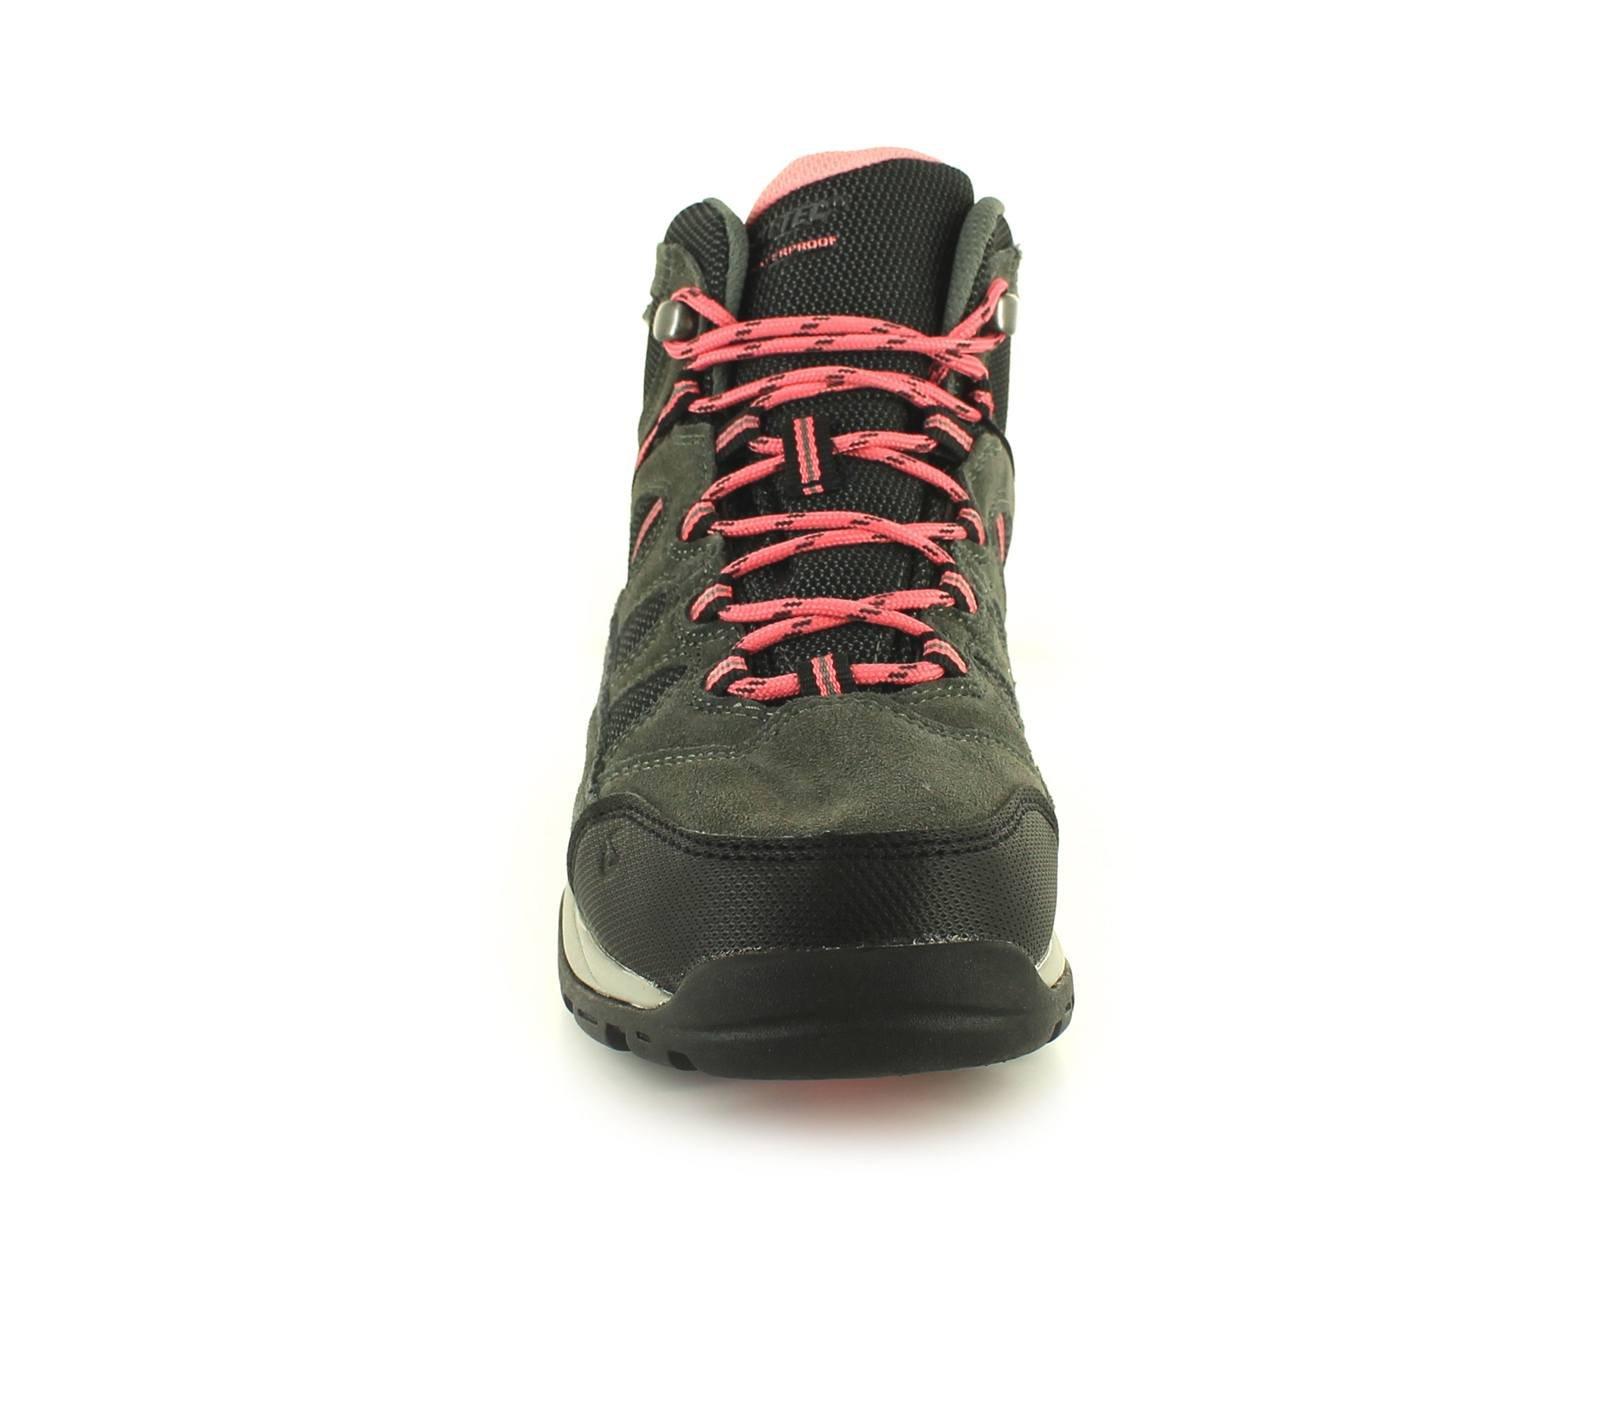 61mhYZF3iBL - Hi-Tec Bandera II Mid WP Women's Walking Shoes